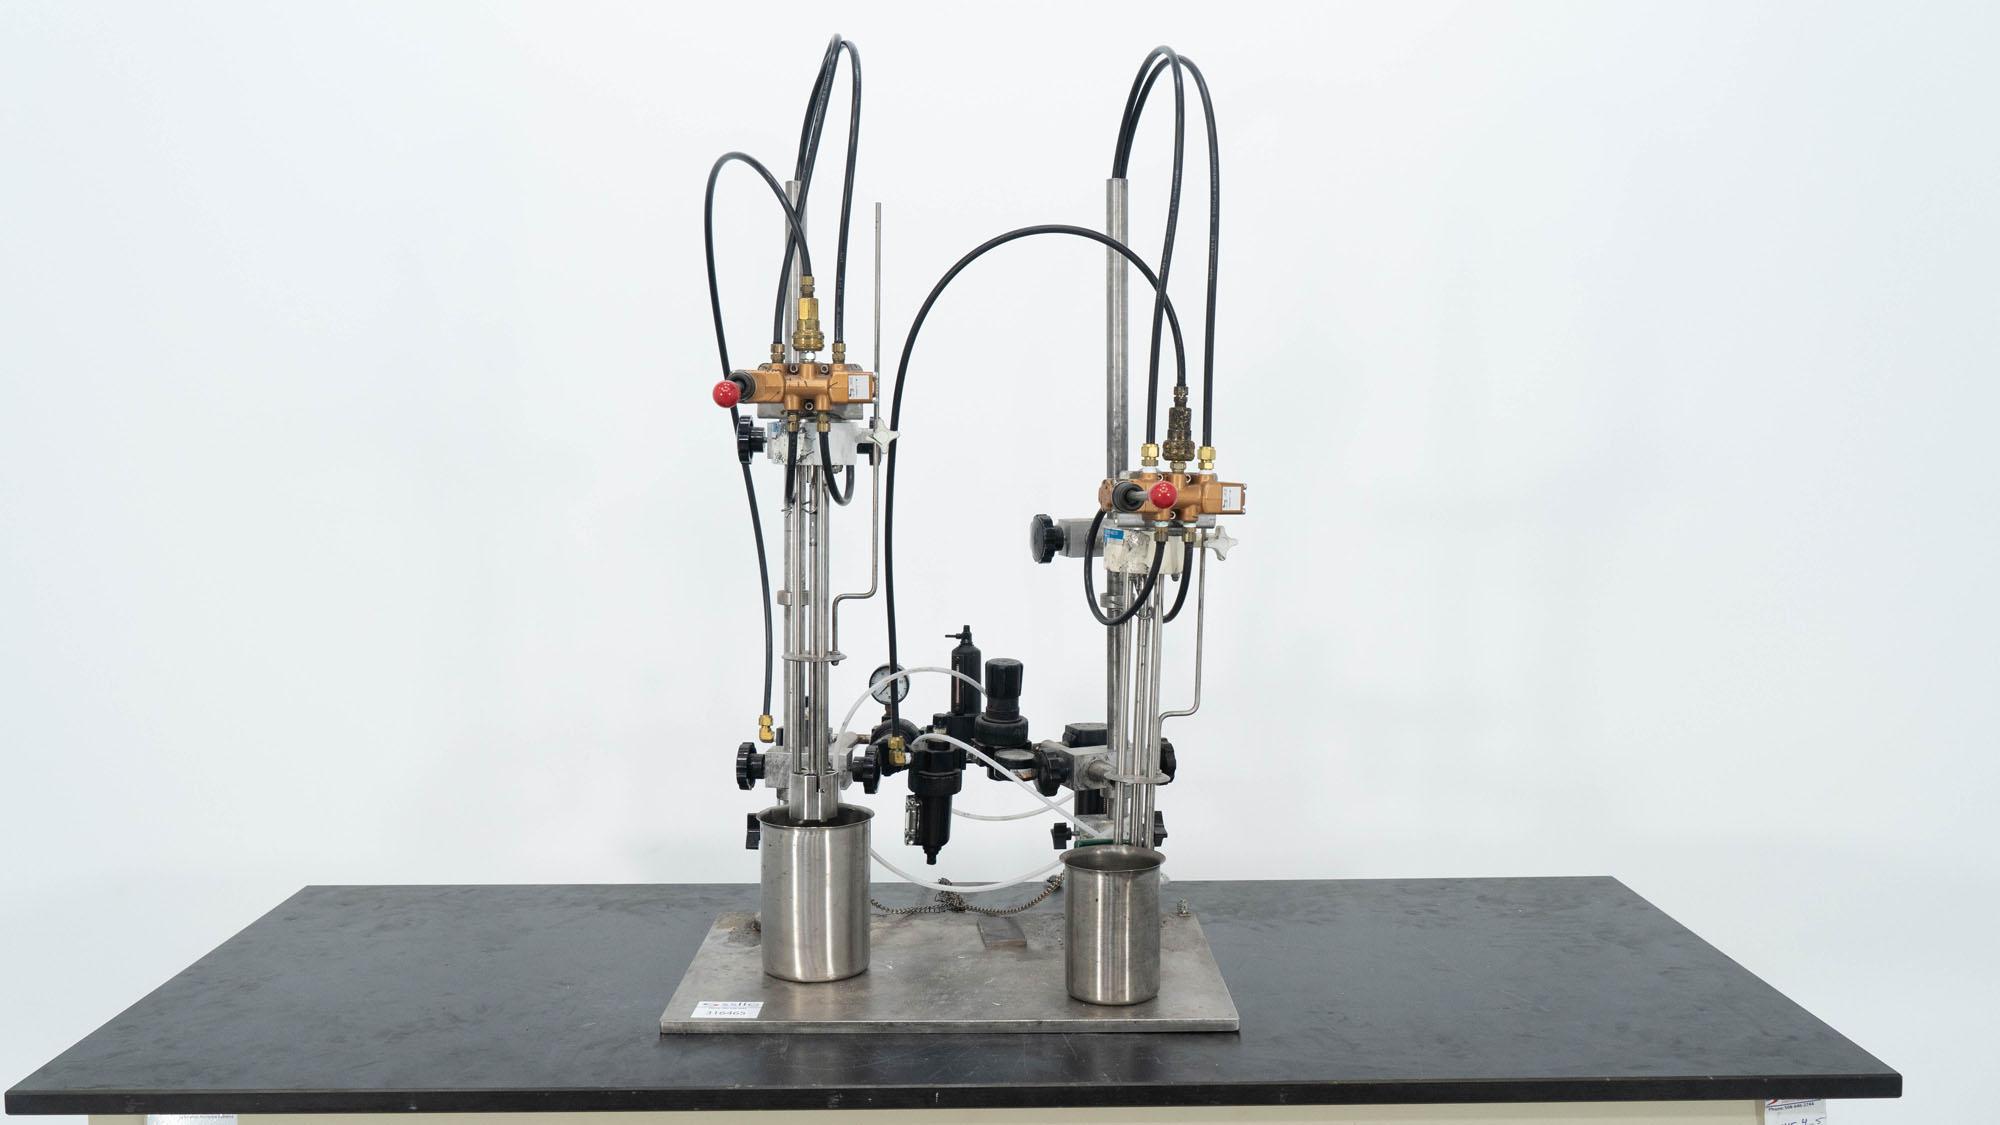 Arde-Barinco Homogenizer, Model CJ4CX